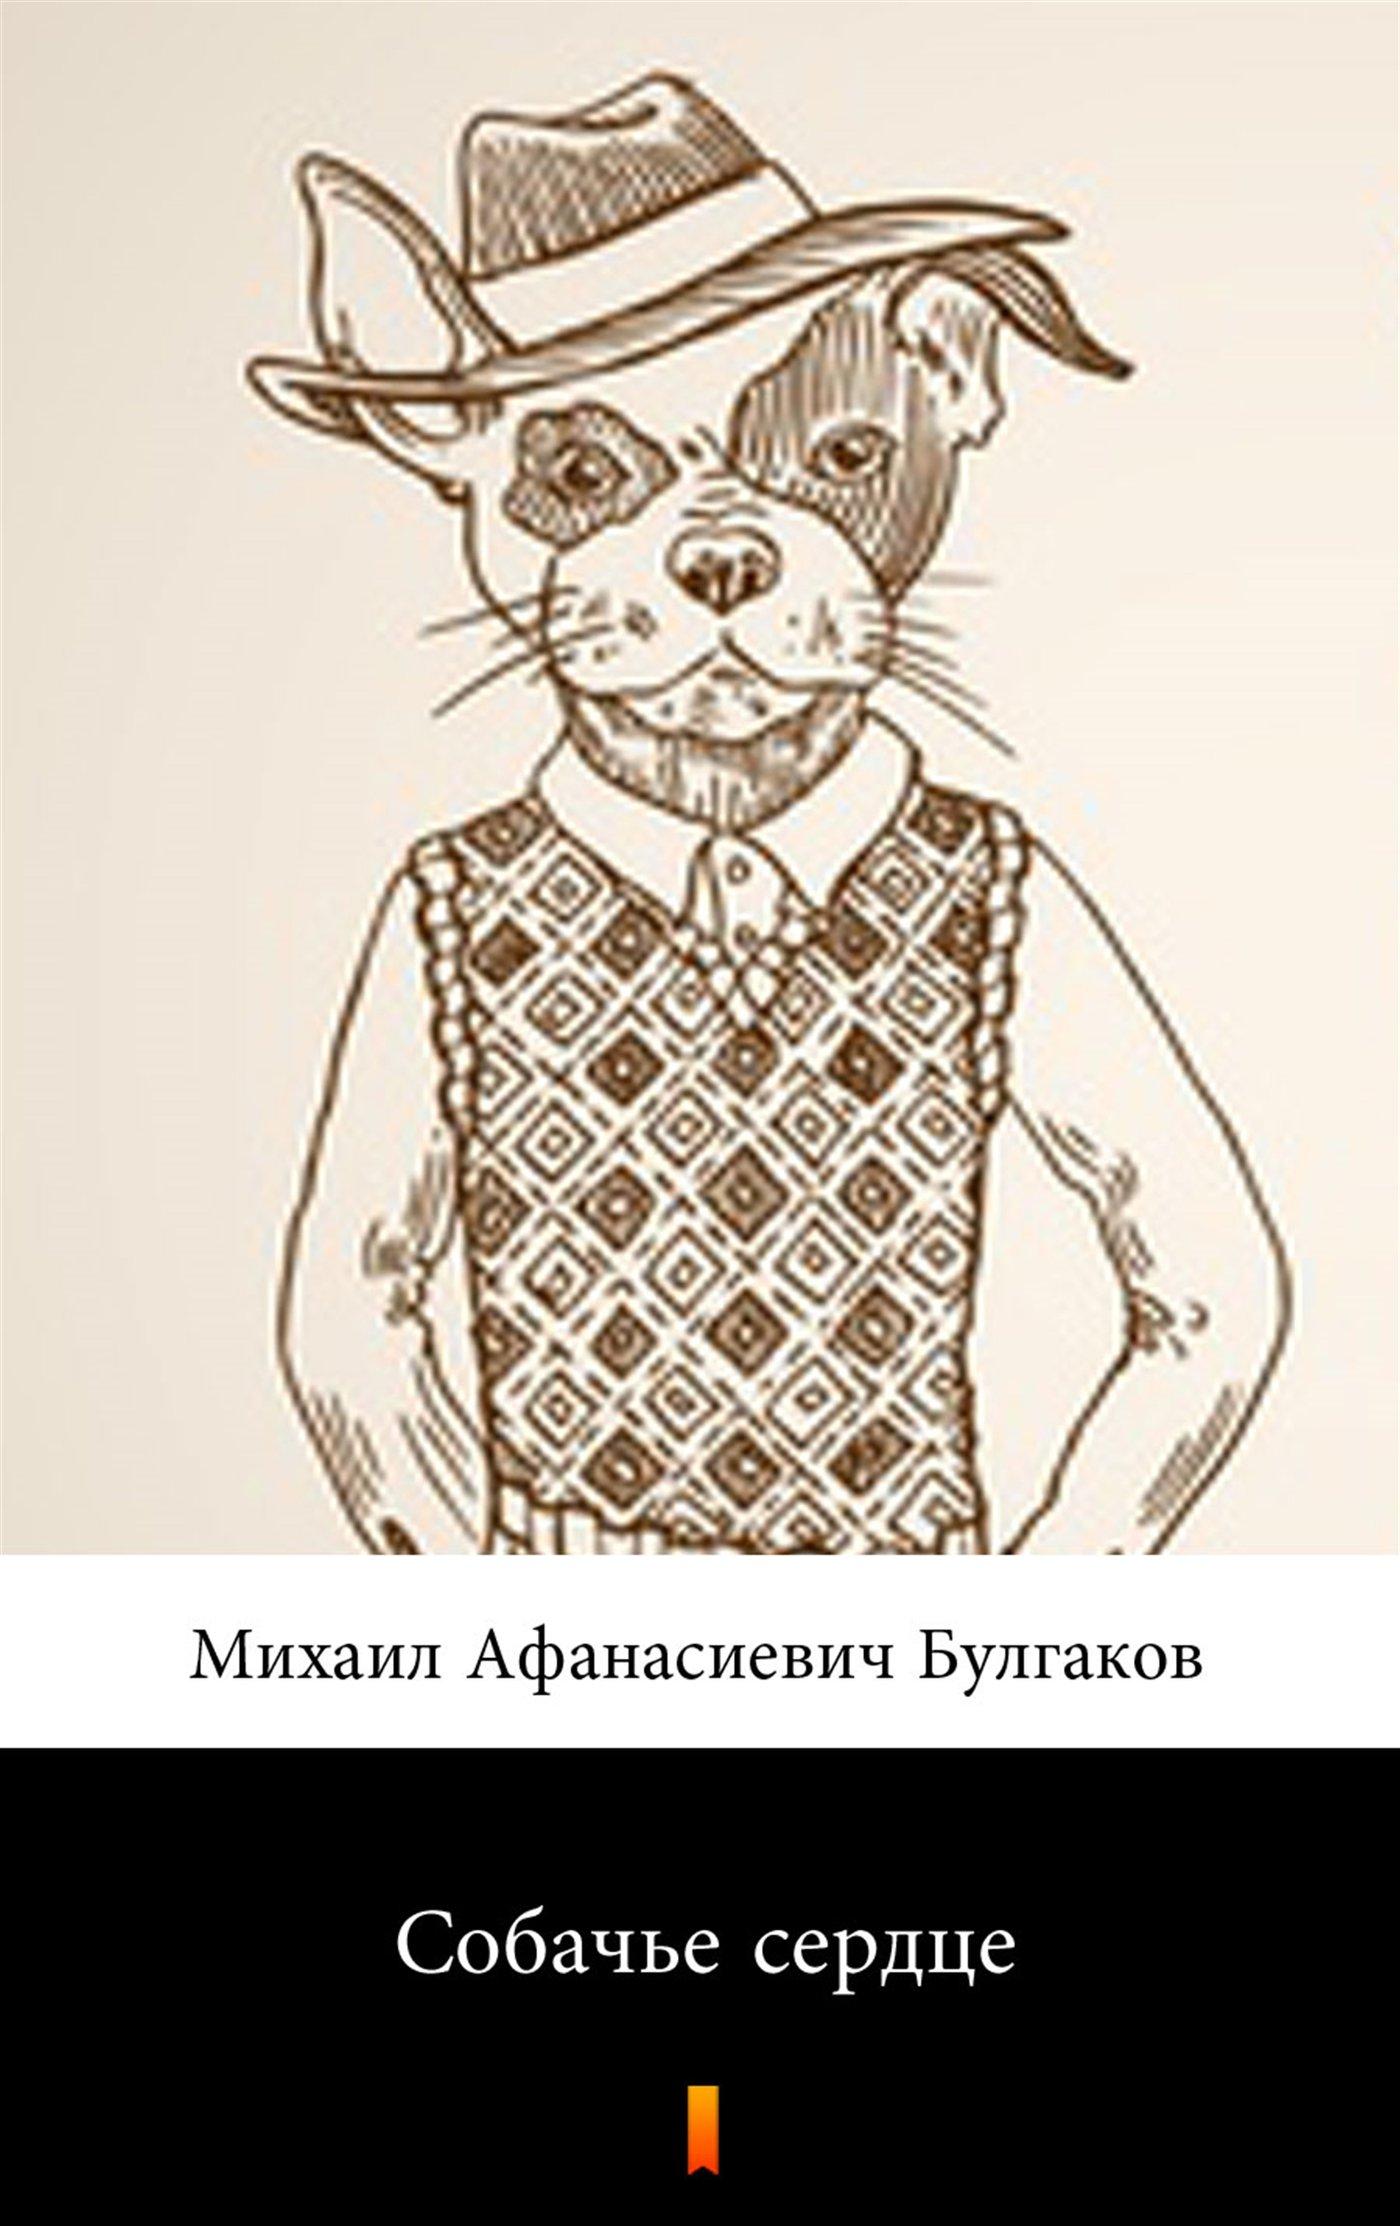 Собачье сердце - Ebook (Książka EPUB) do pobrania w formacie EPUB